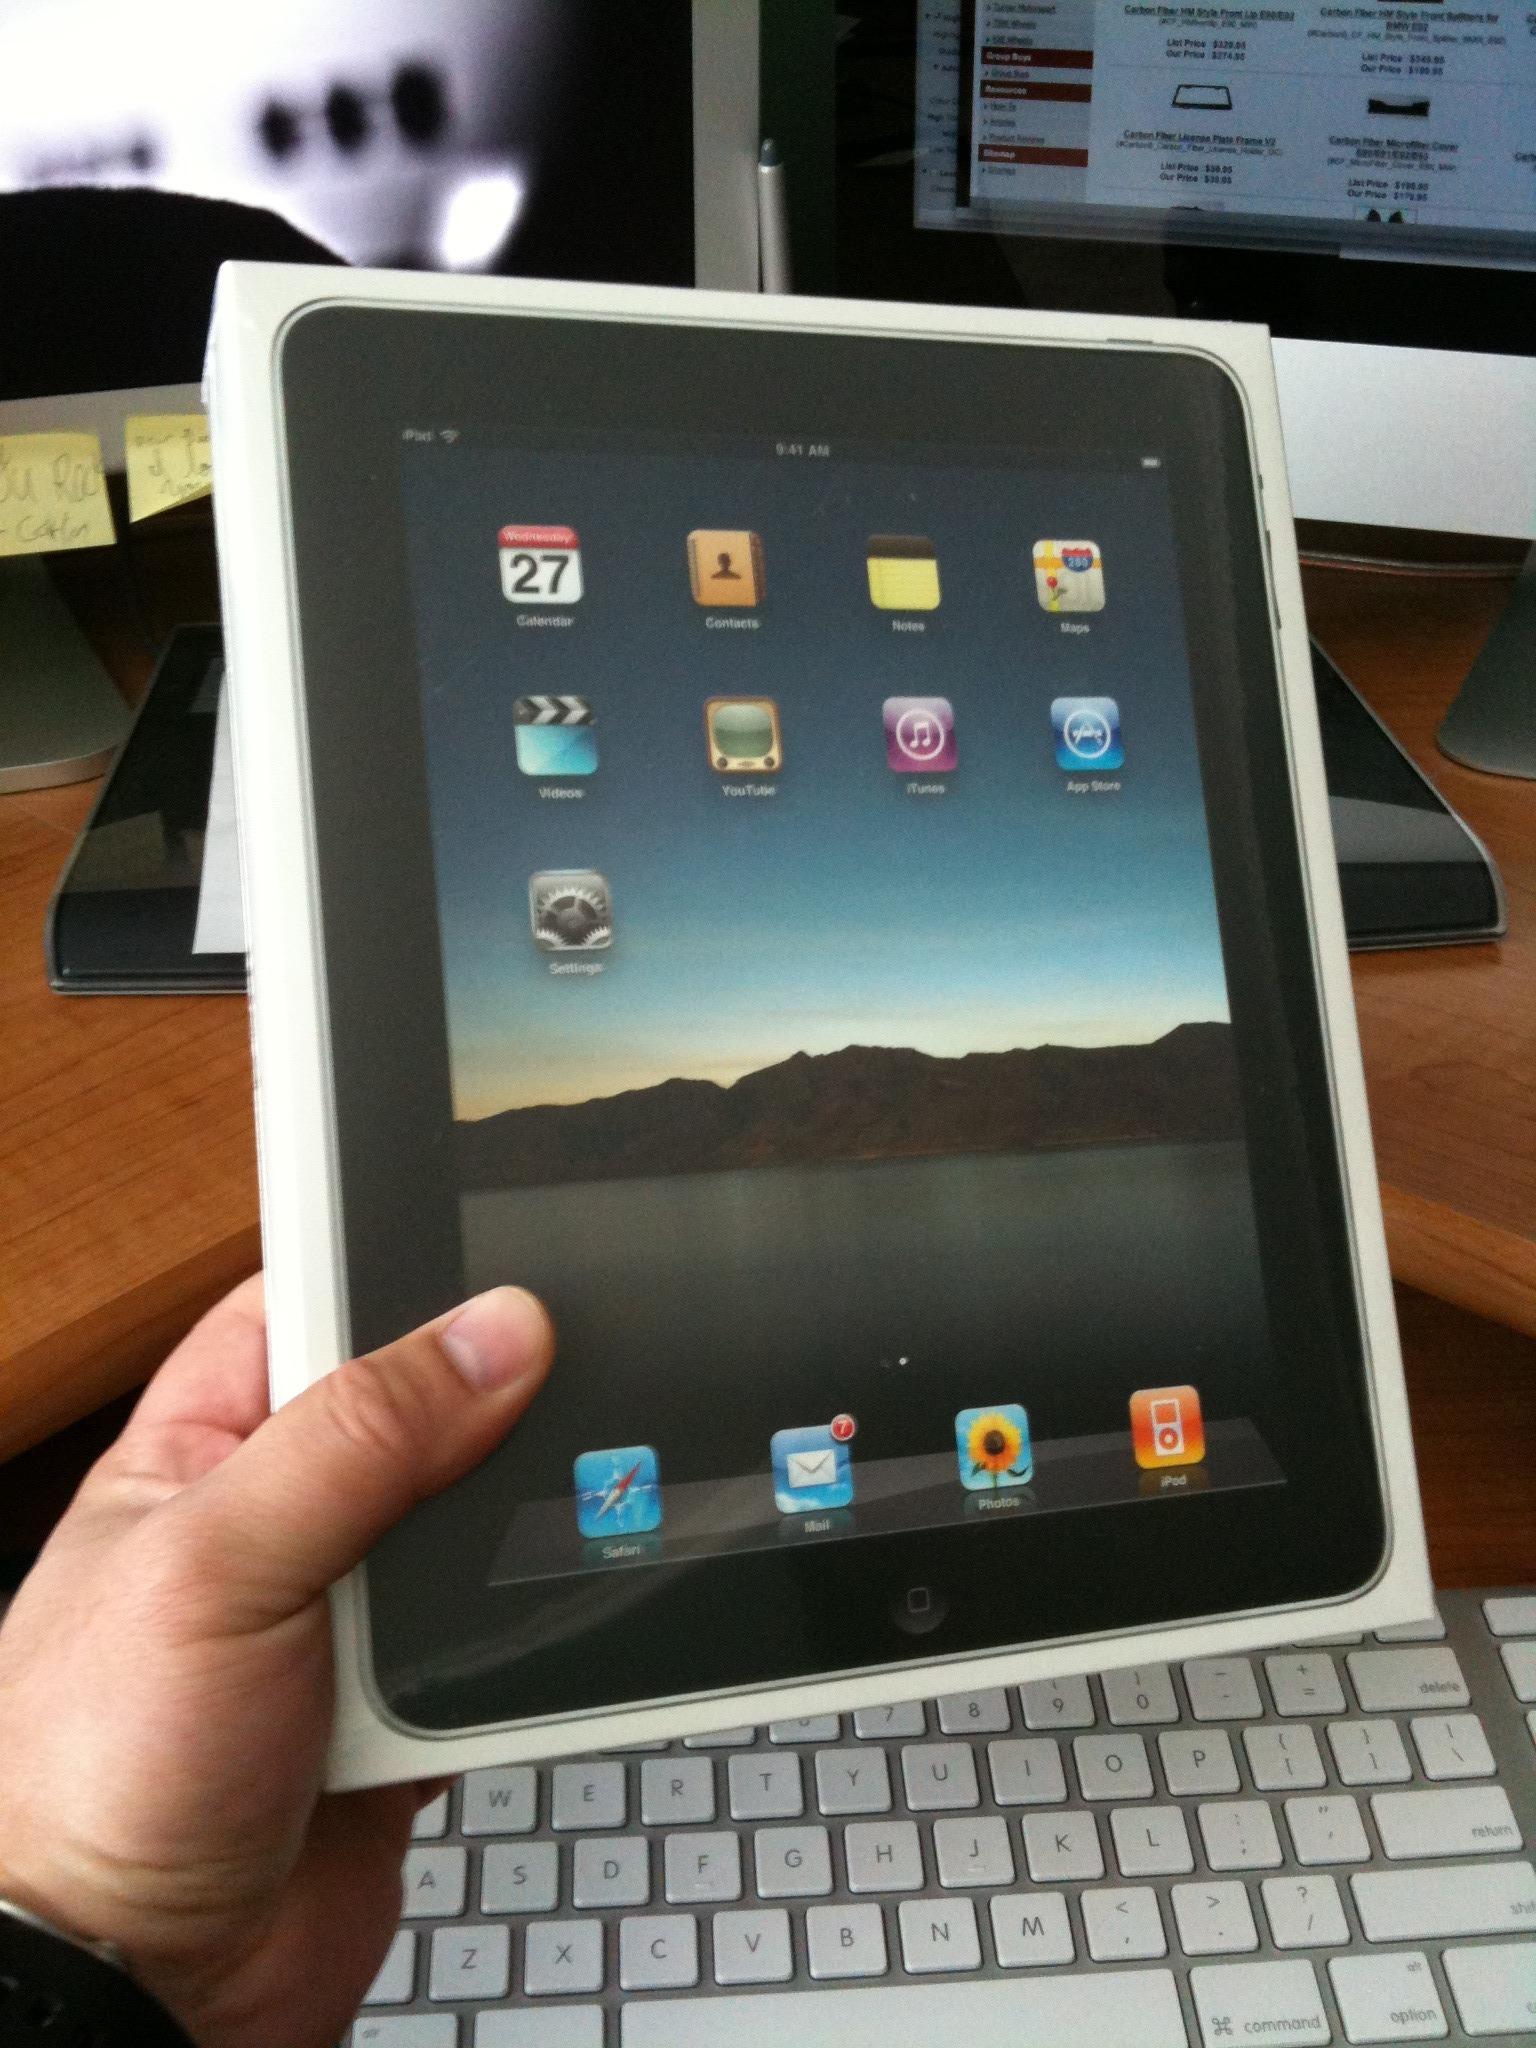 iPad has arrived. Sync in progress